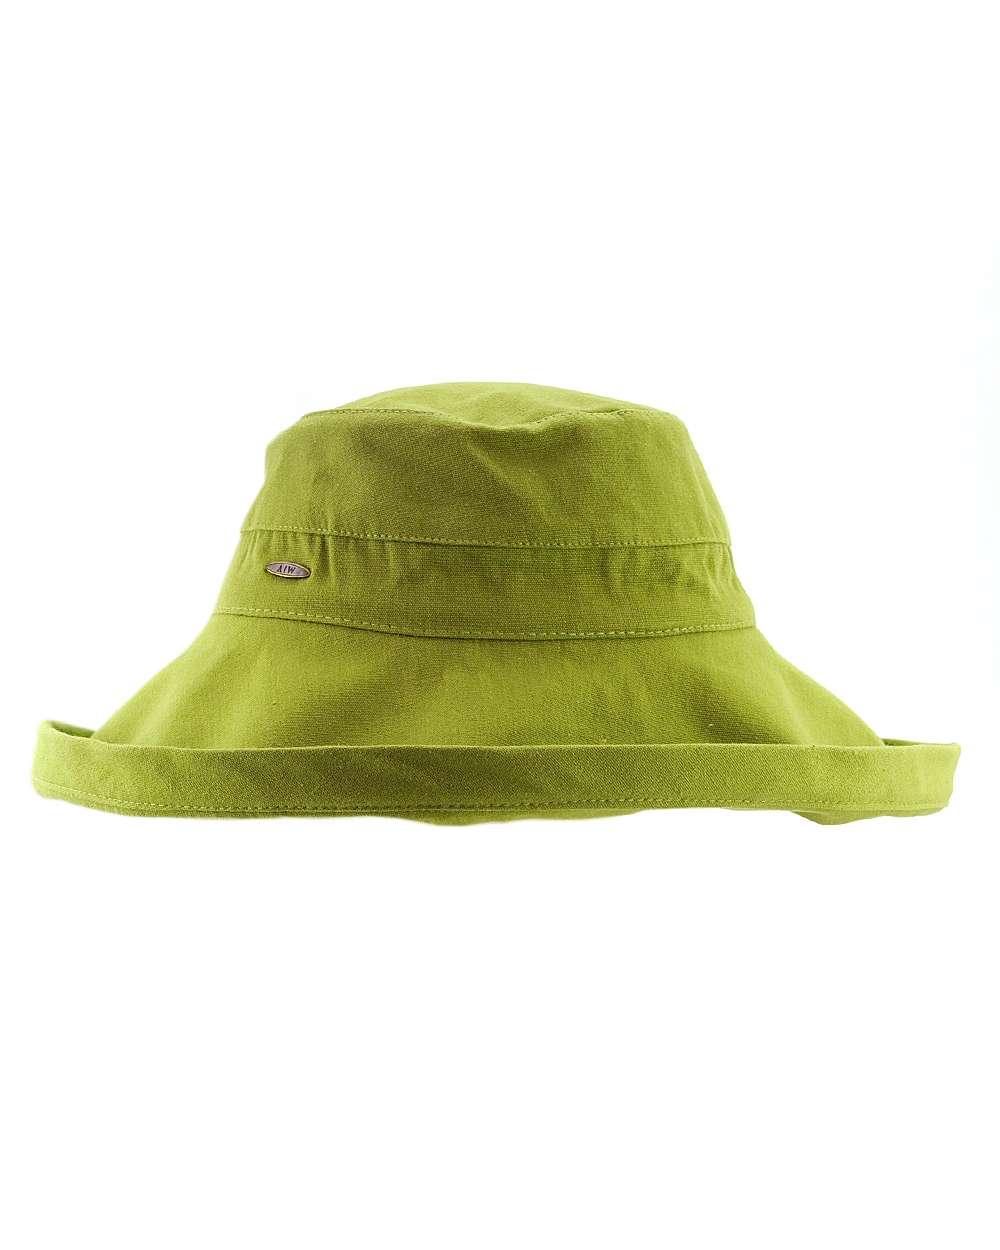 NYFashion101 Unisex Cotton Upturn/Wide Brim Sun Hat with Inner Drawstring at Sears.com